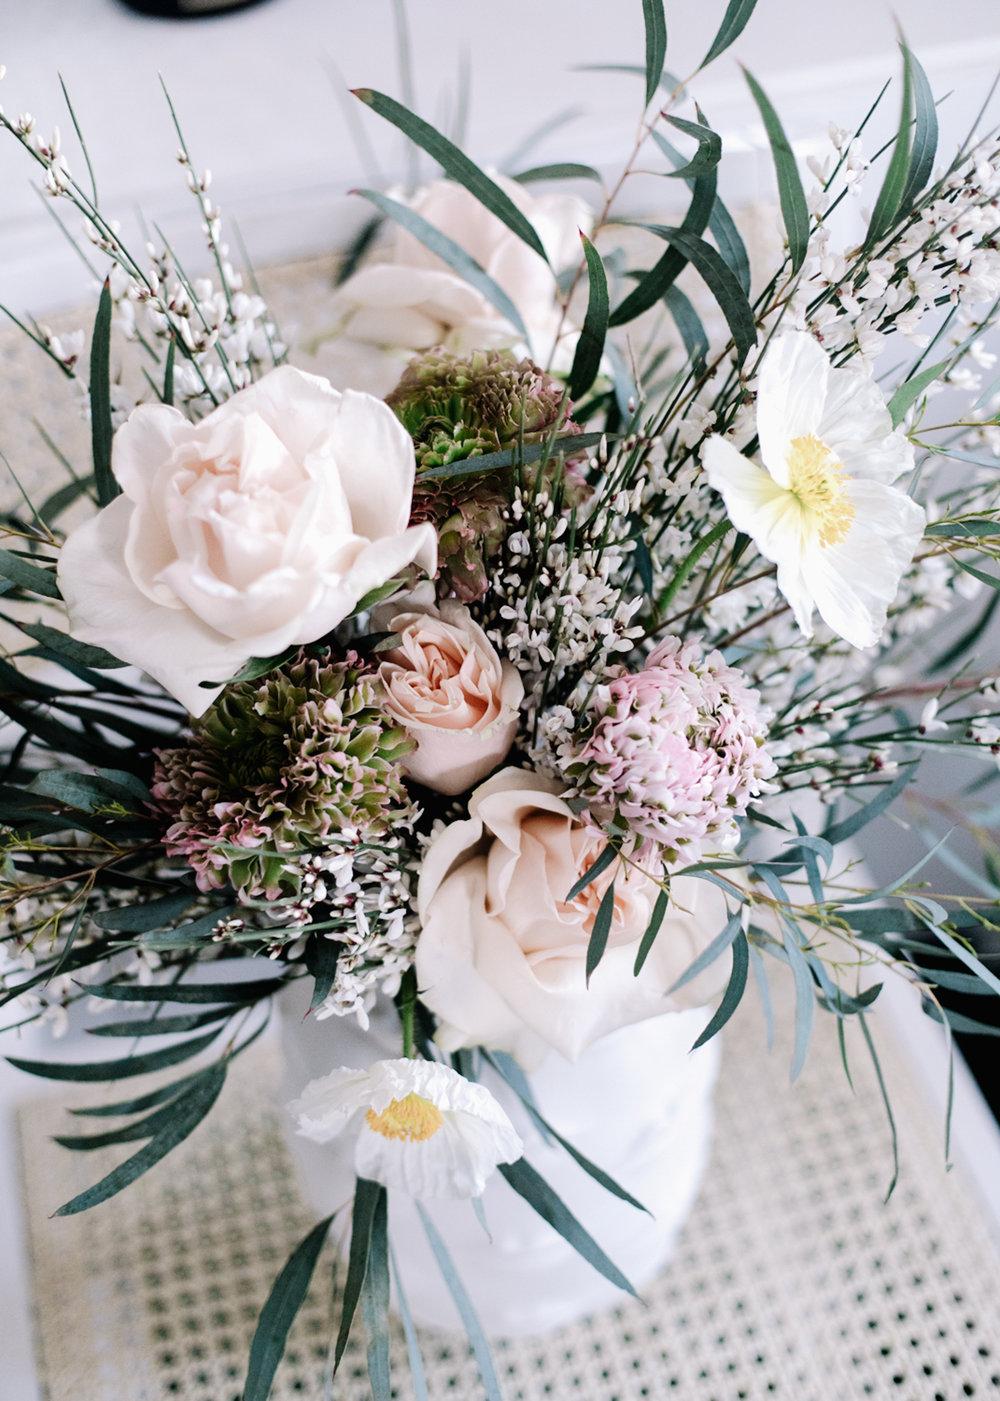 Valentines Day Florals | A Fabulous Fete